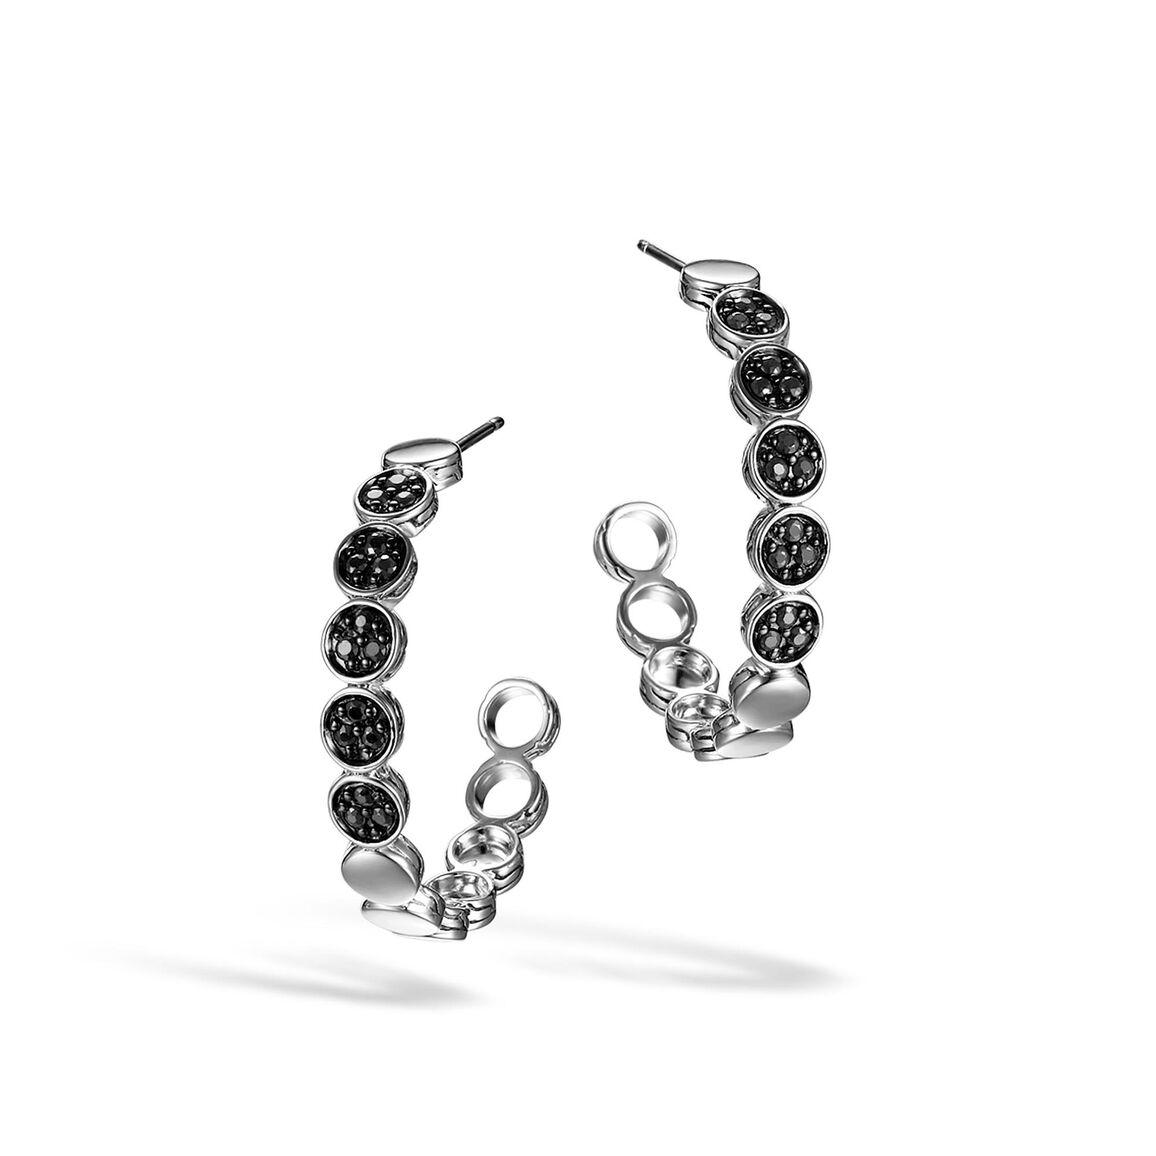 Small Hoop Earrings with Black Sapphire